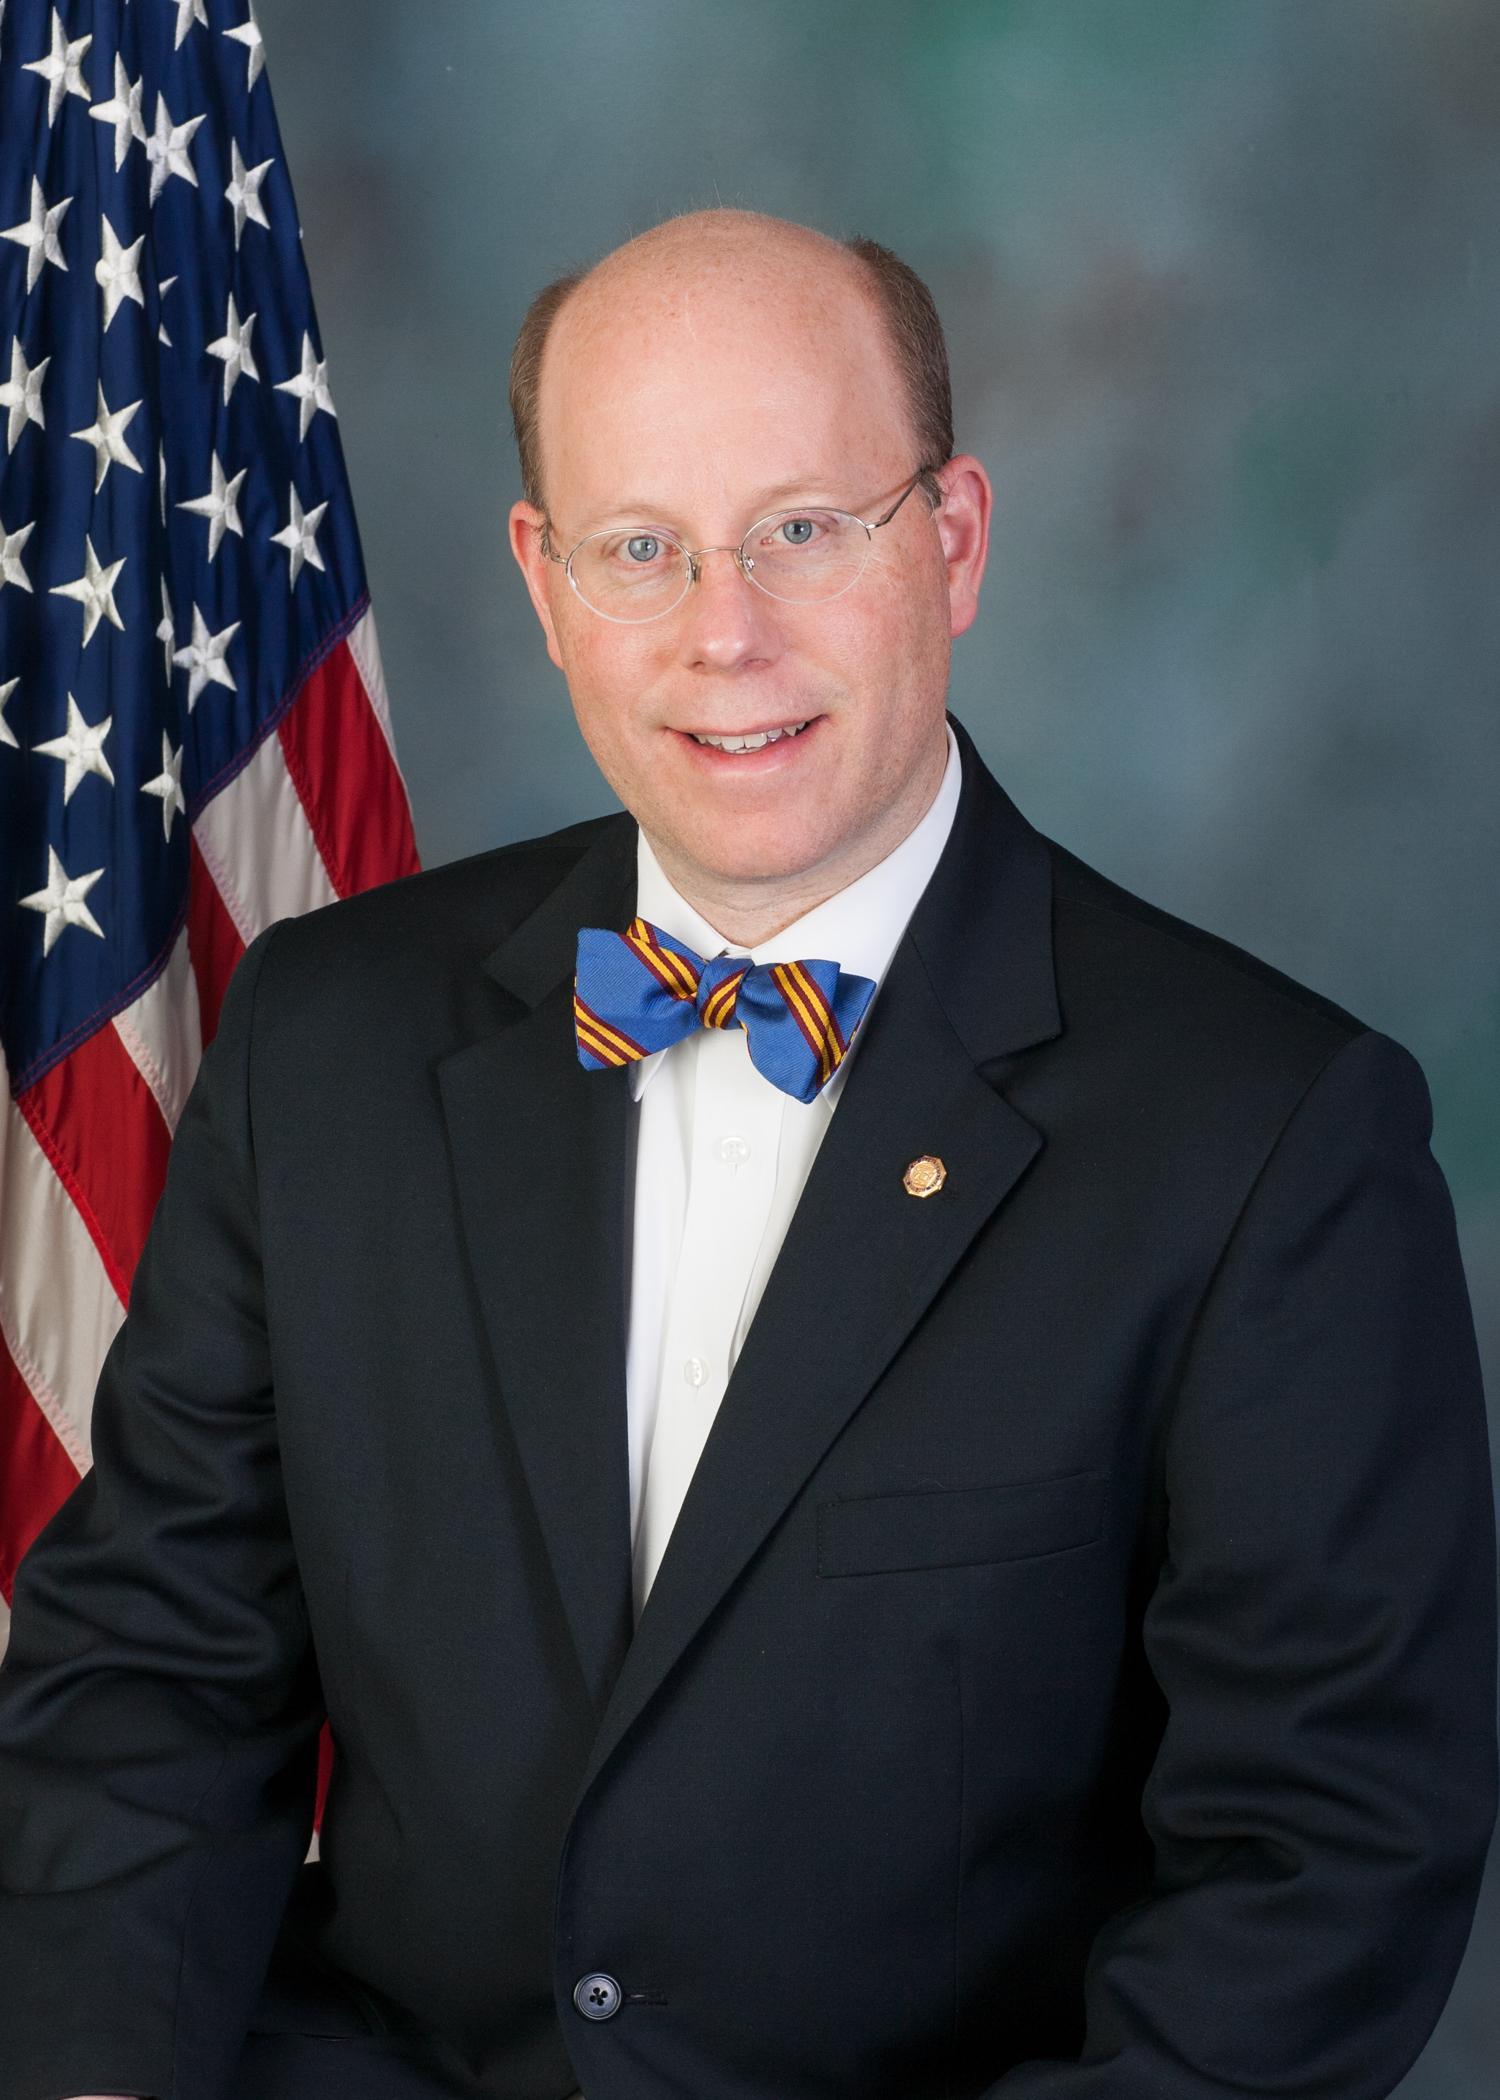 Representative Paul Schemel